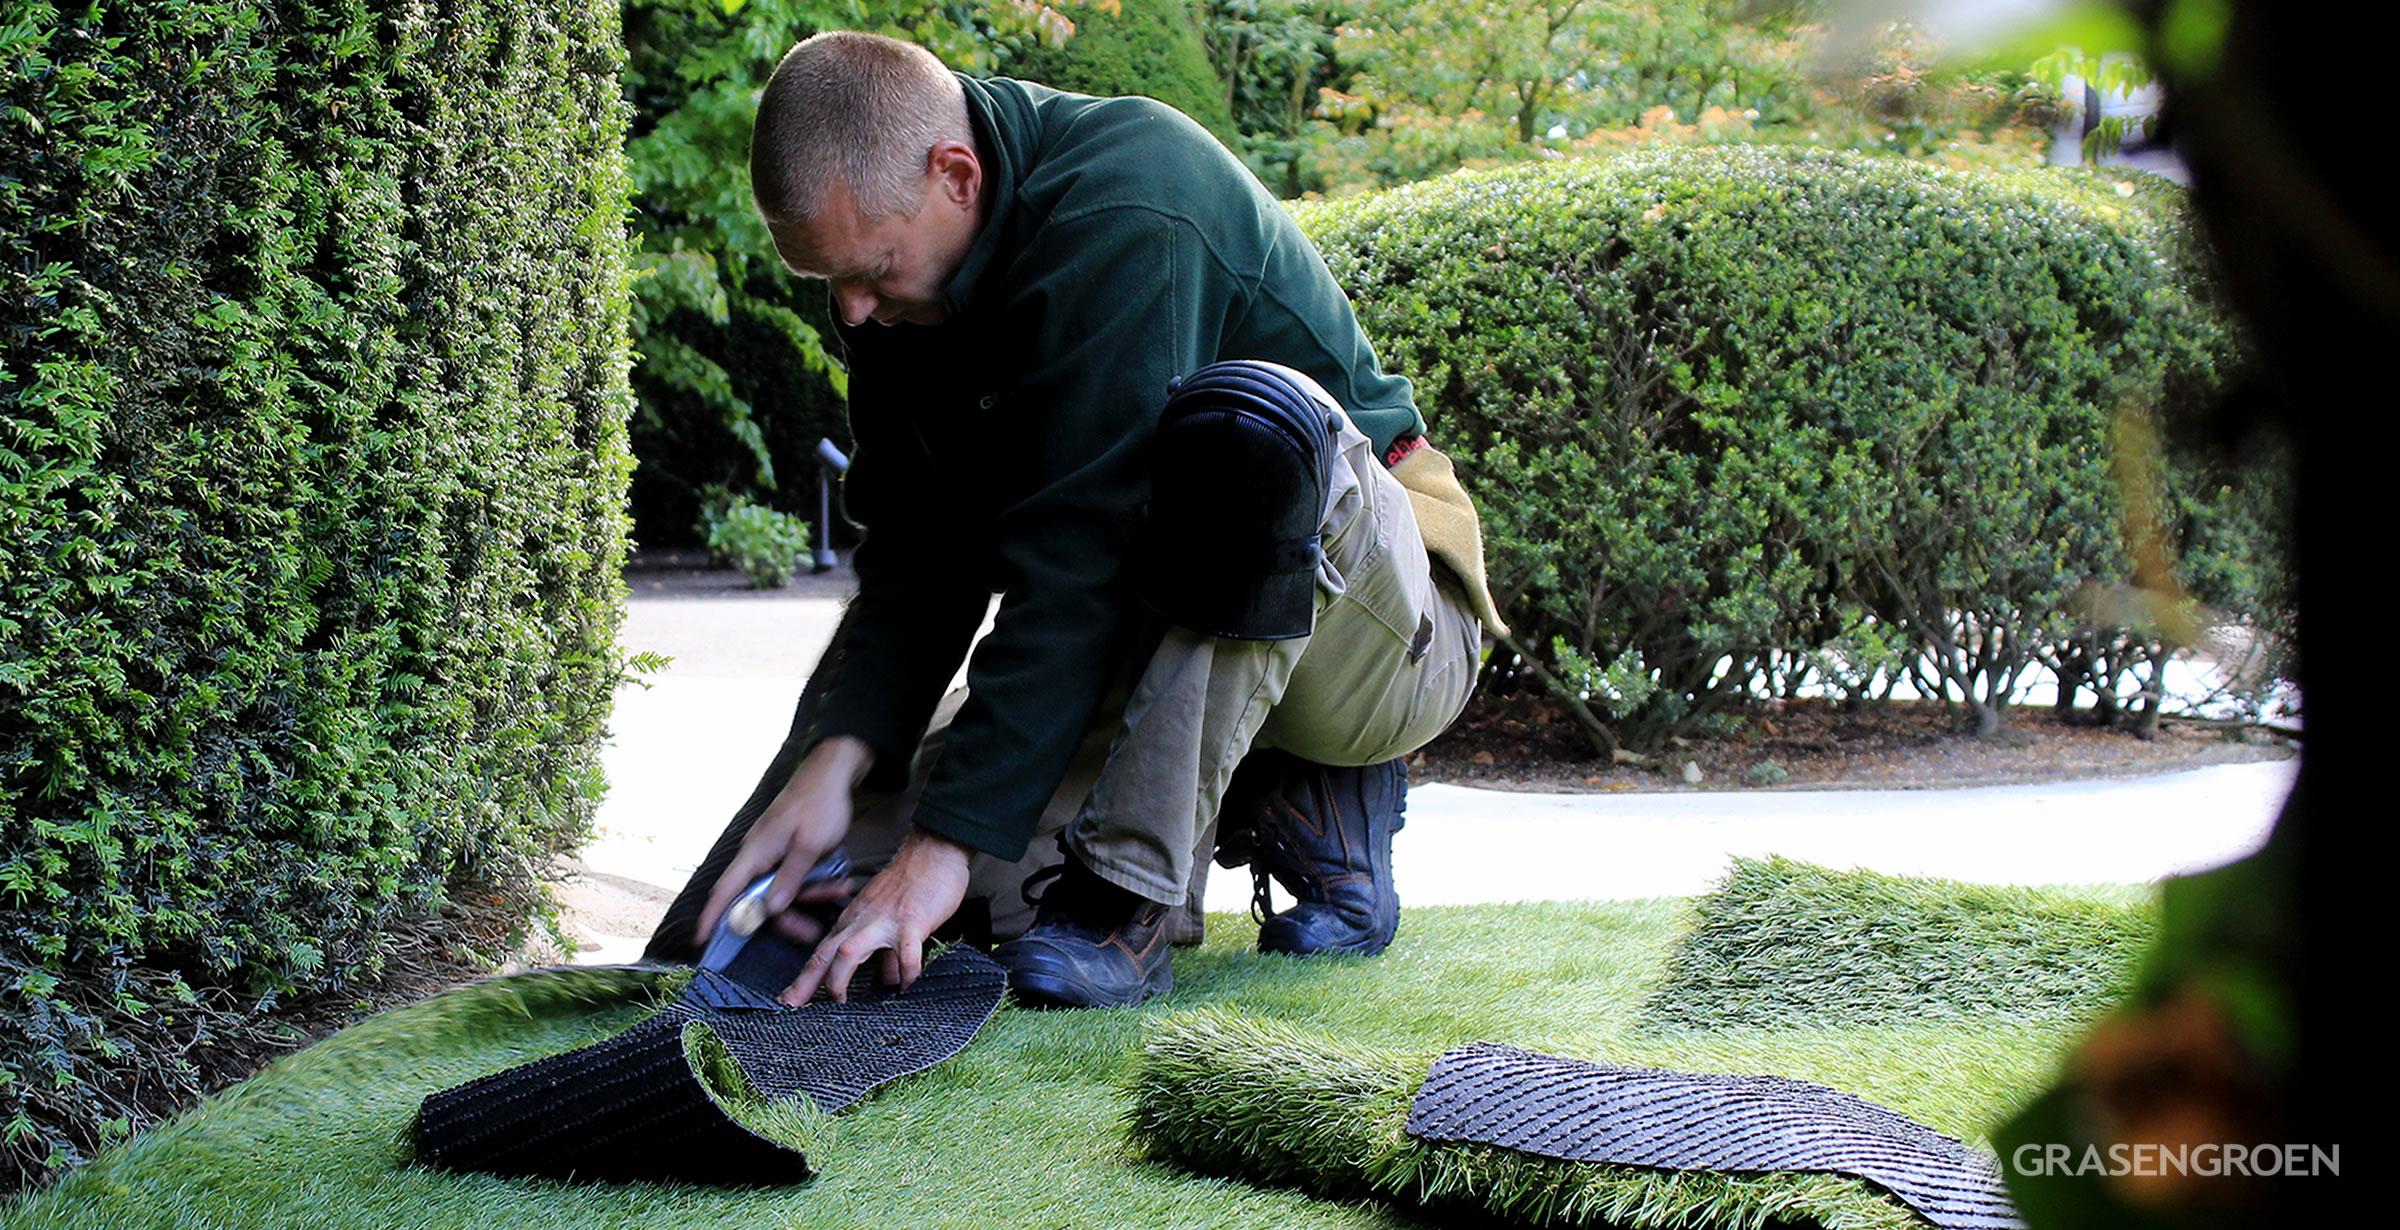 Kunstgrasleggenverlijmenslider1 • Gras en Groen Kunstgras